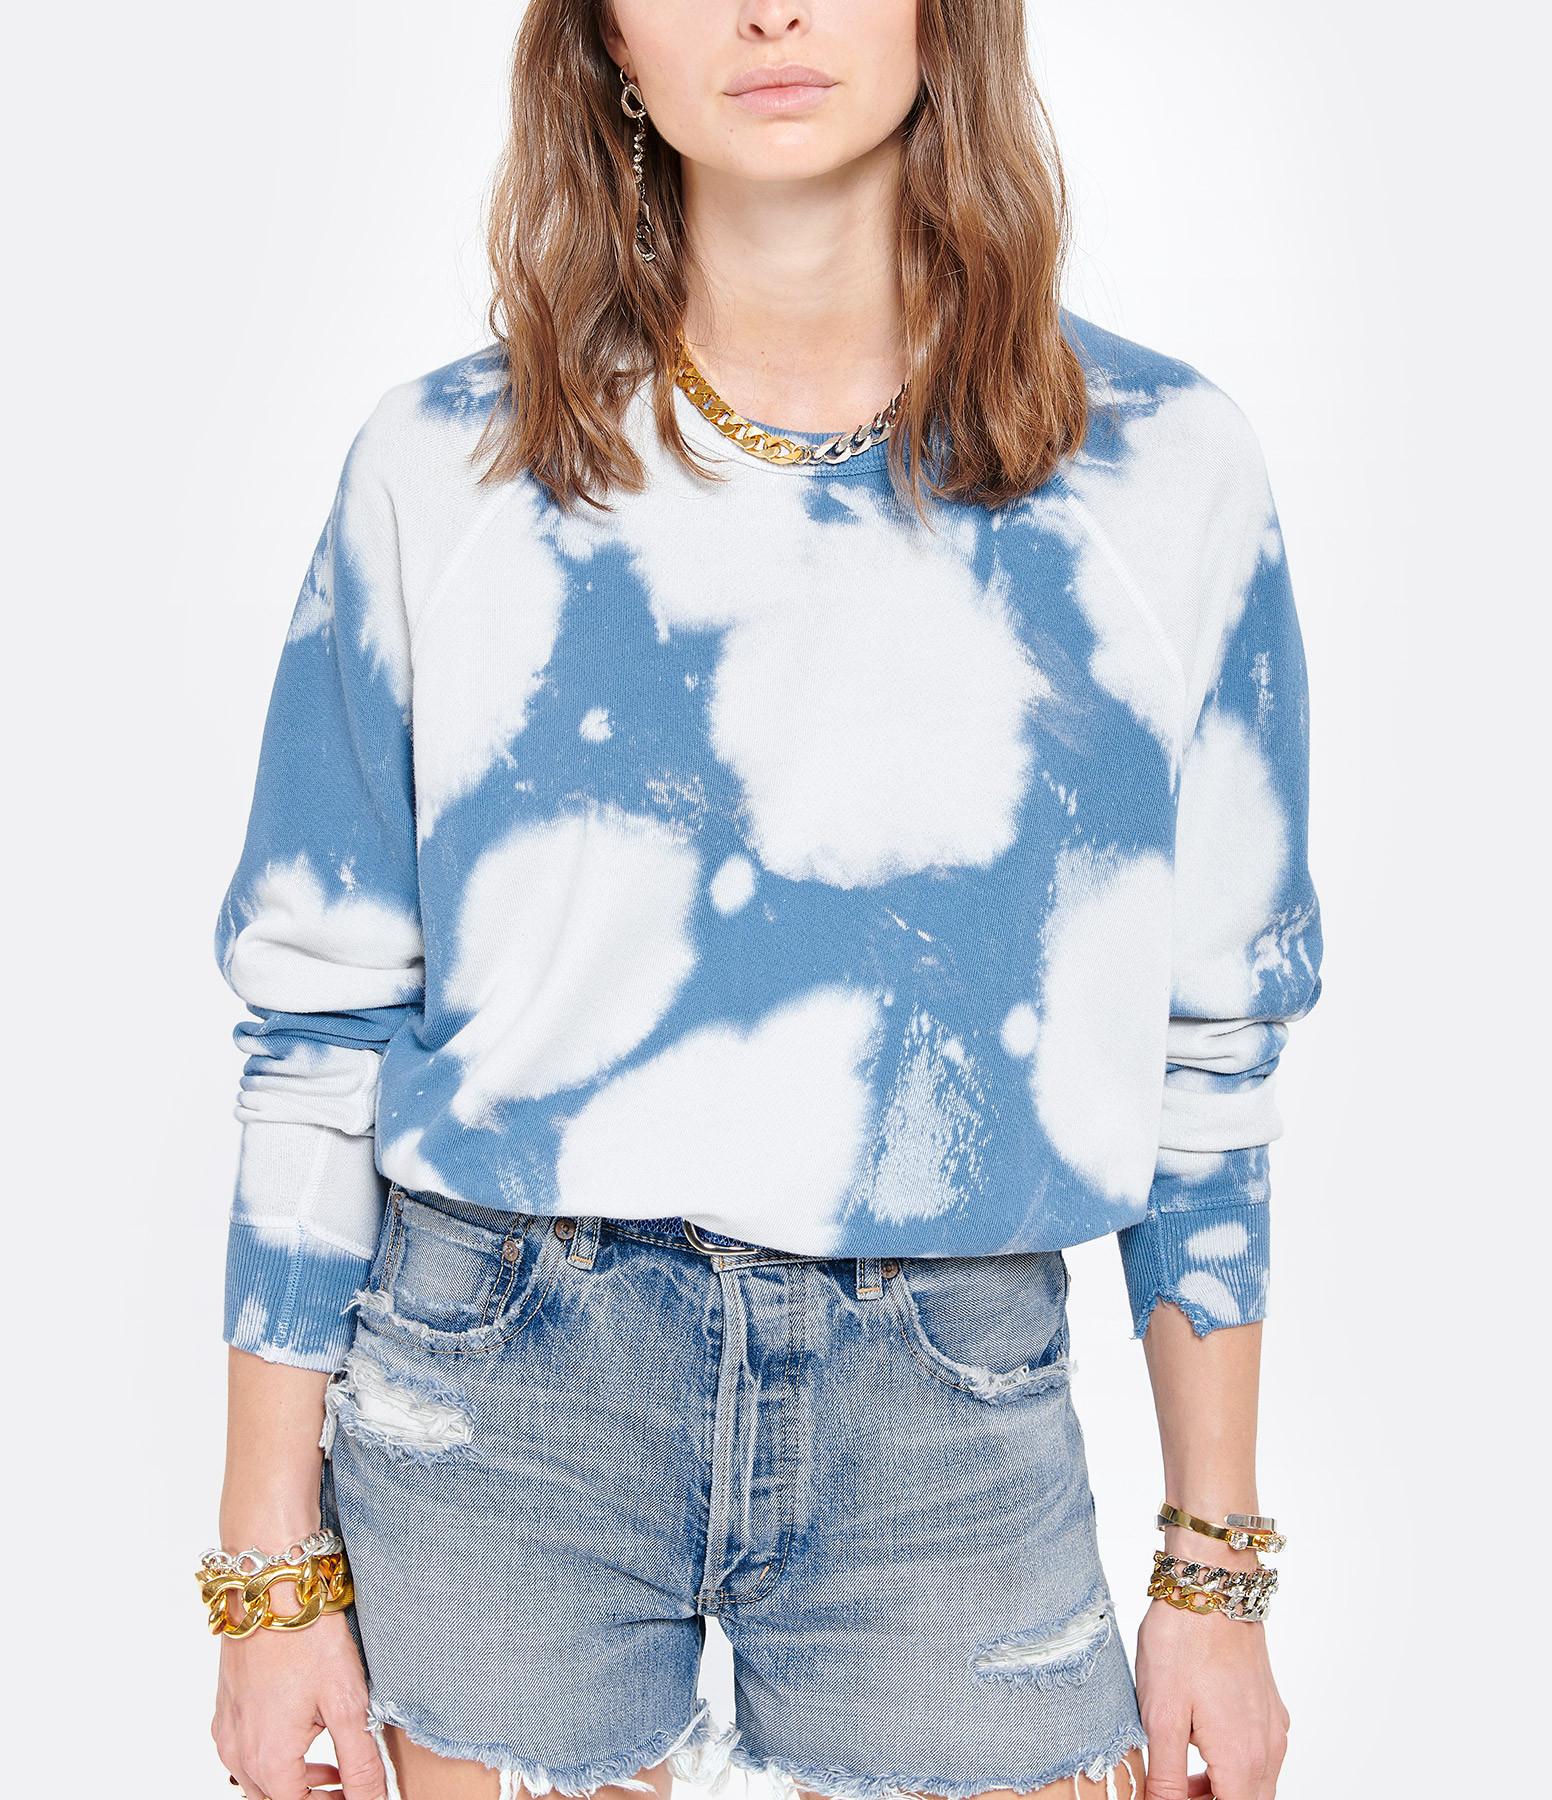 THE GREAT - Sweatshirt The College Coton Imprimé Nuage